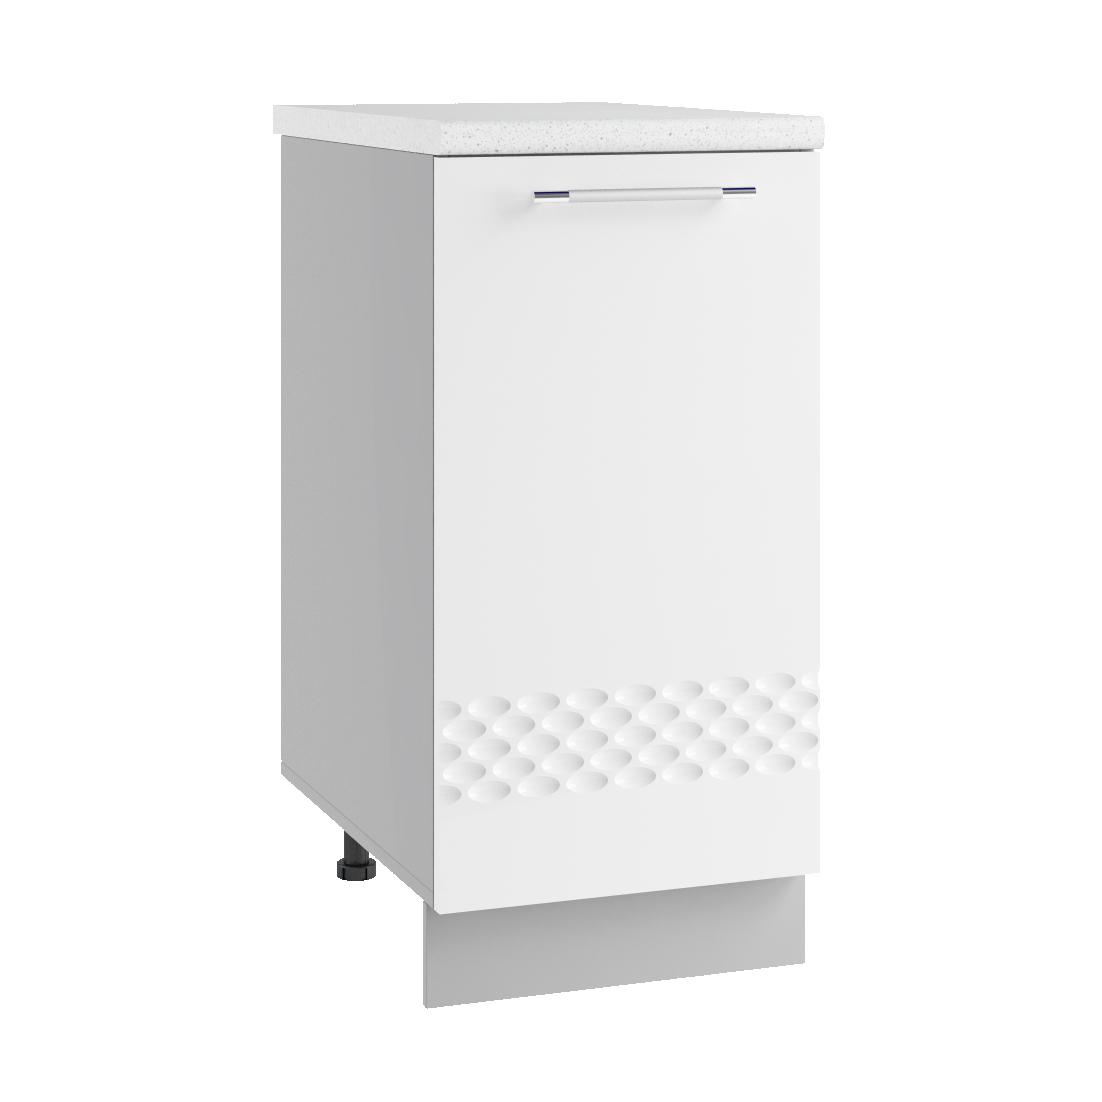 Кухня Капля 3D С 350  Шкаф нижний петли справа